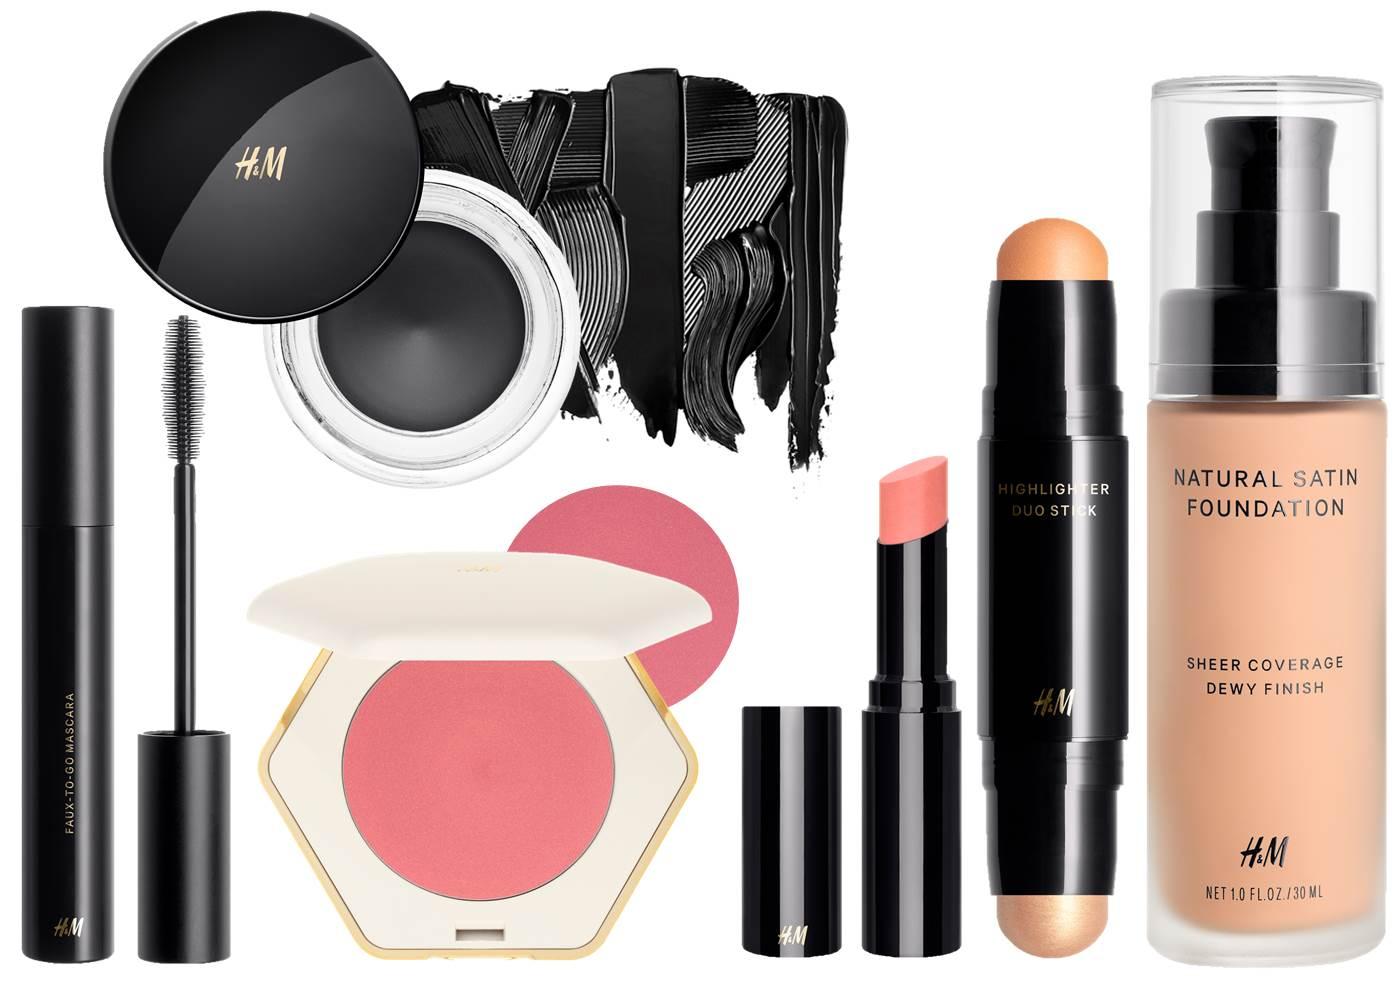 Produtos de beleza usados para criar o look de beleza do desfile da Erdem para a H&M